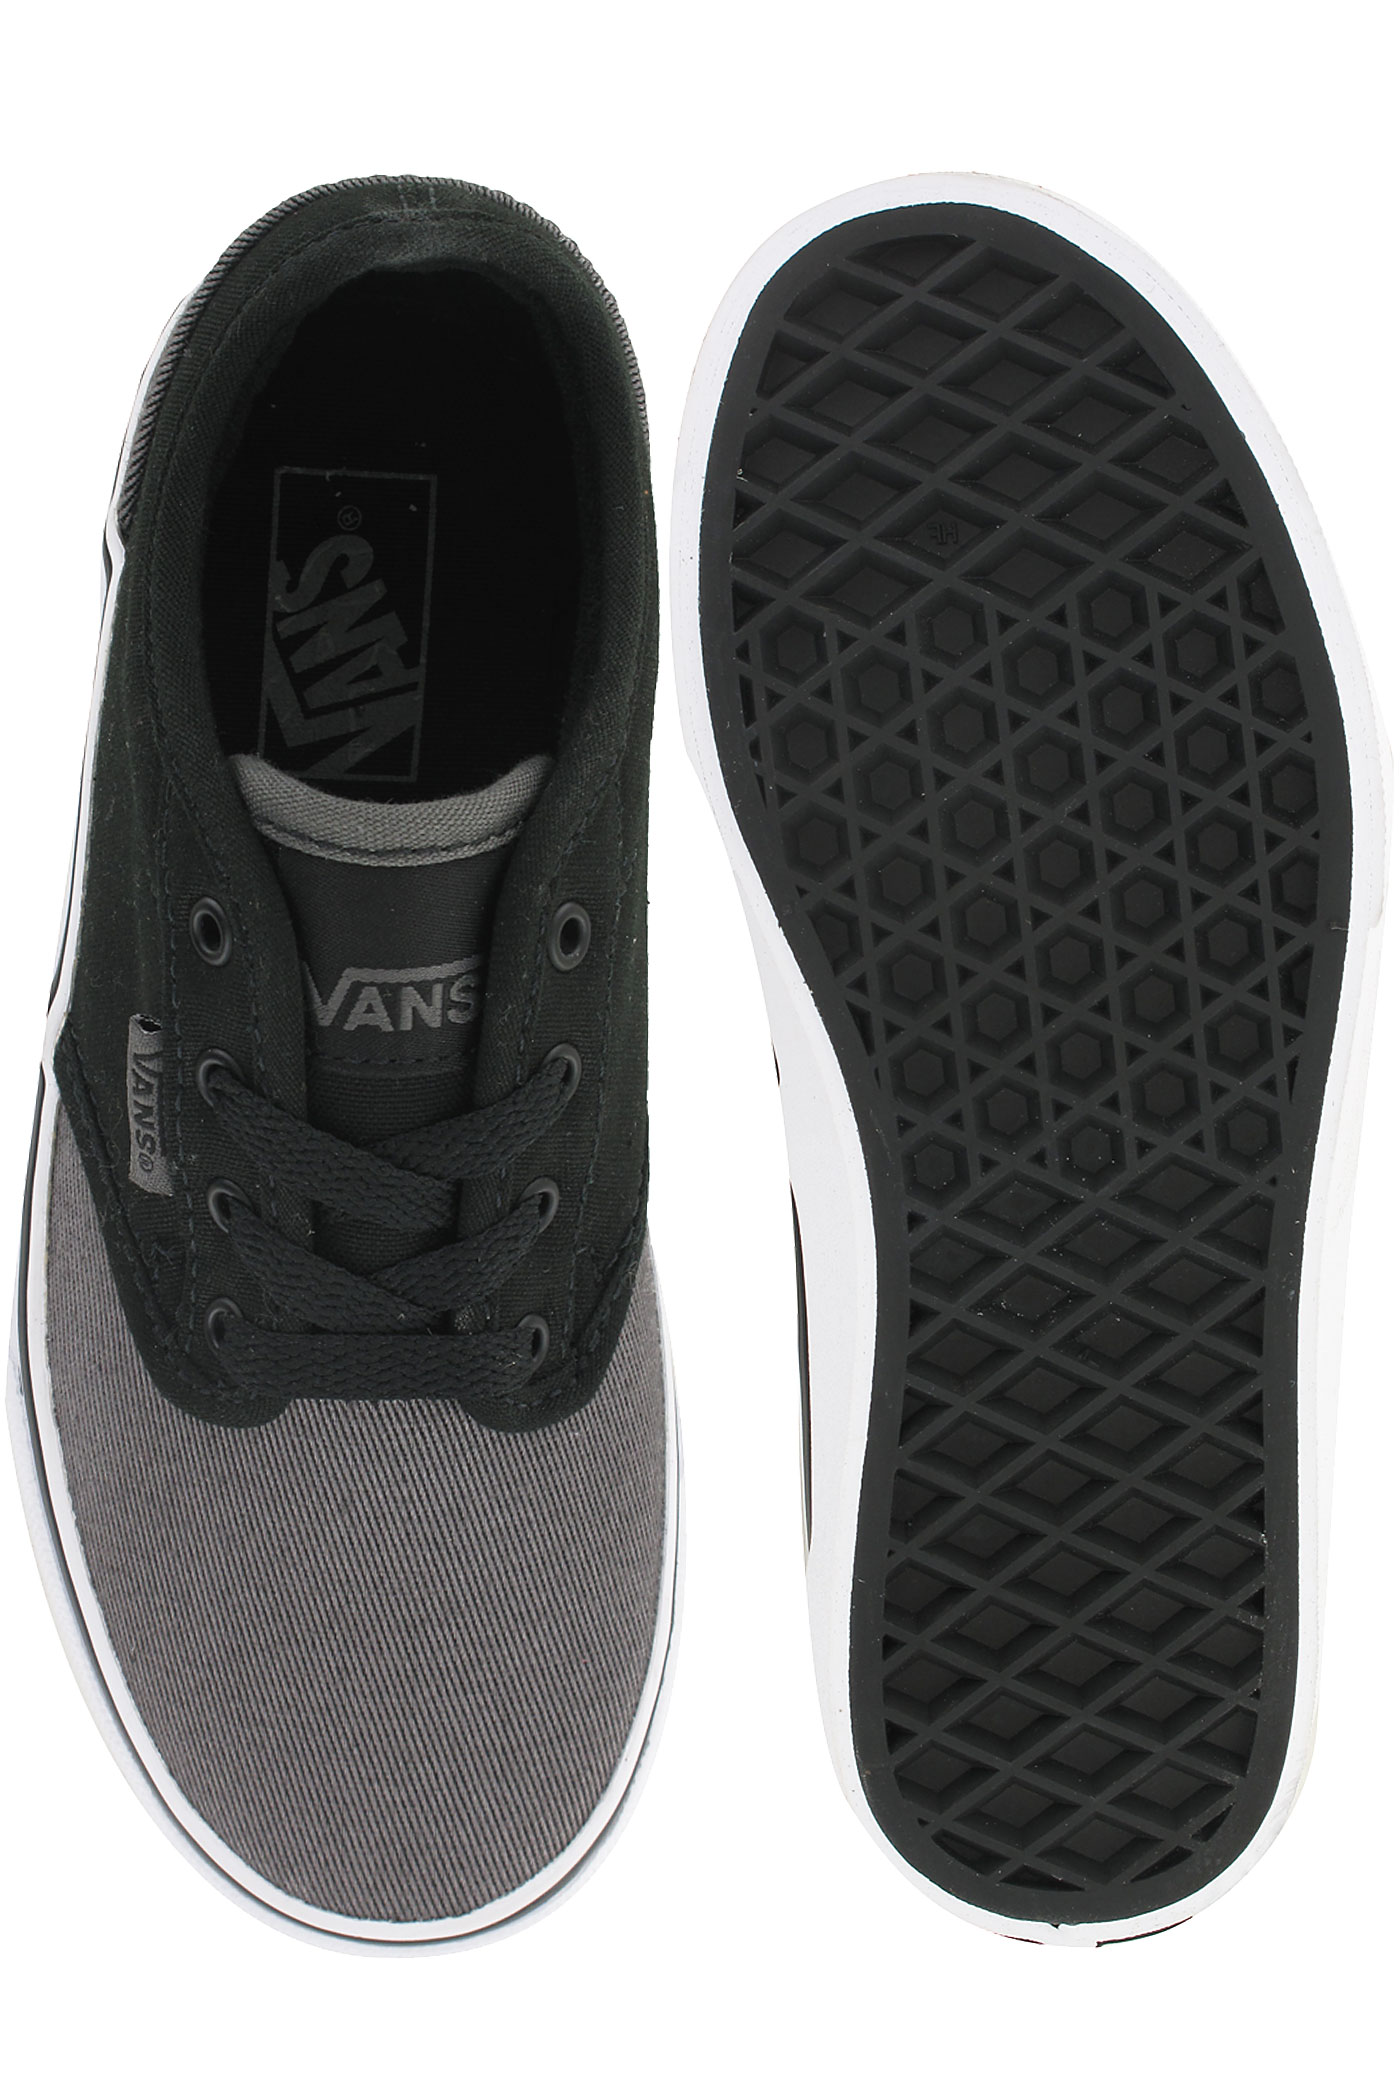 vans atwood black grey